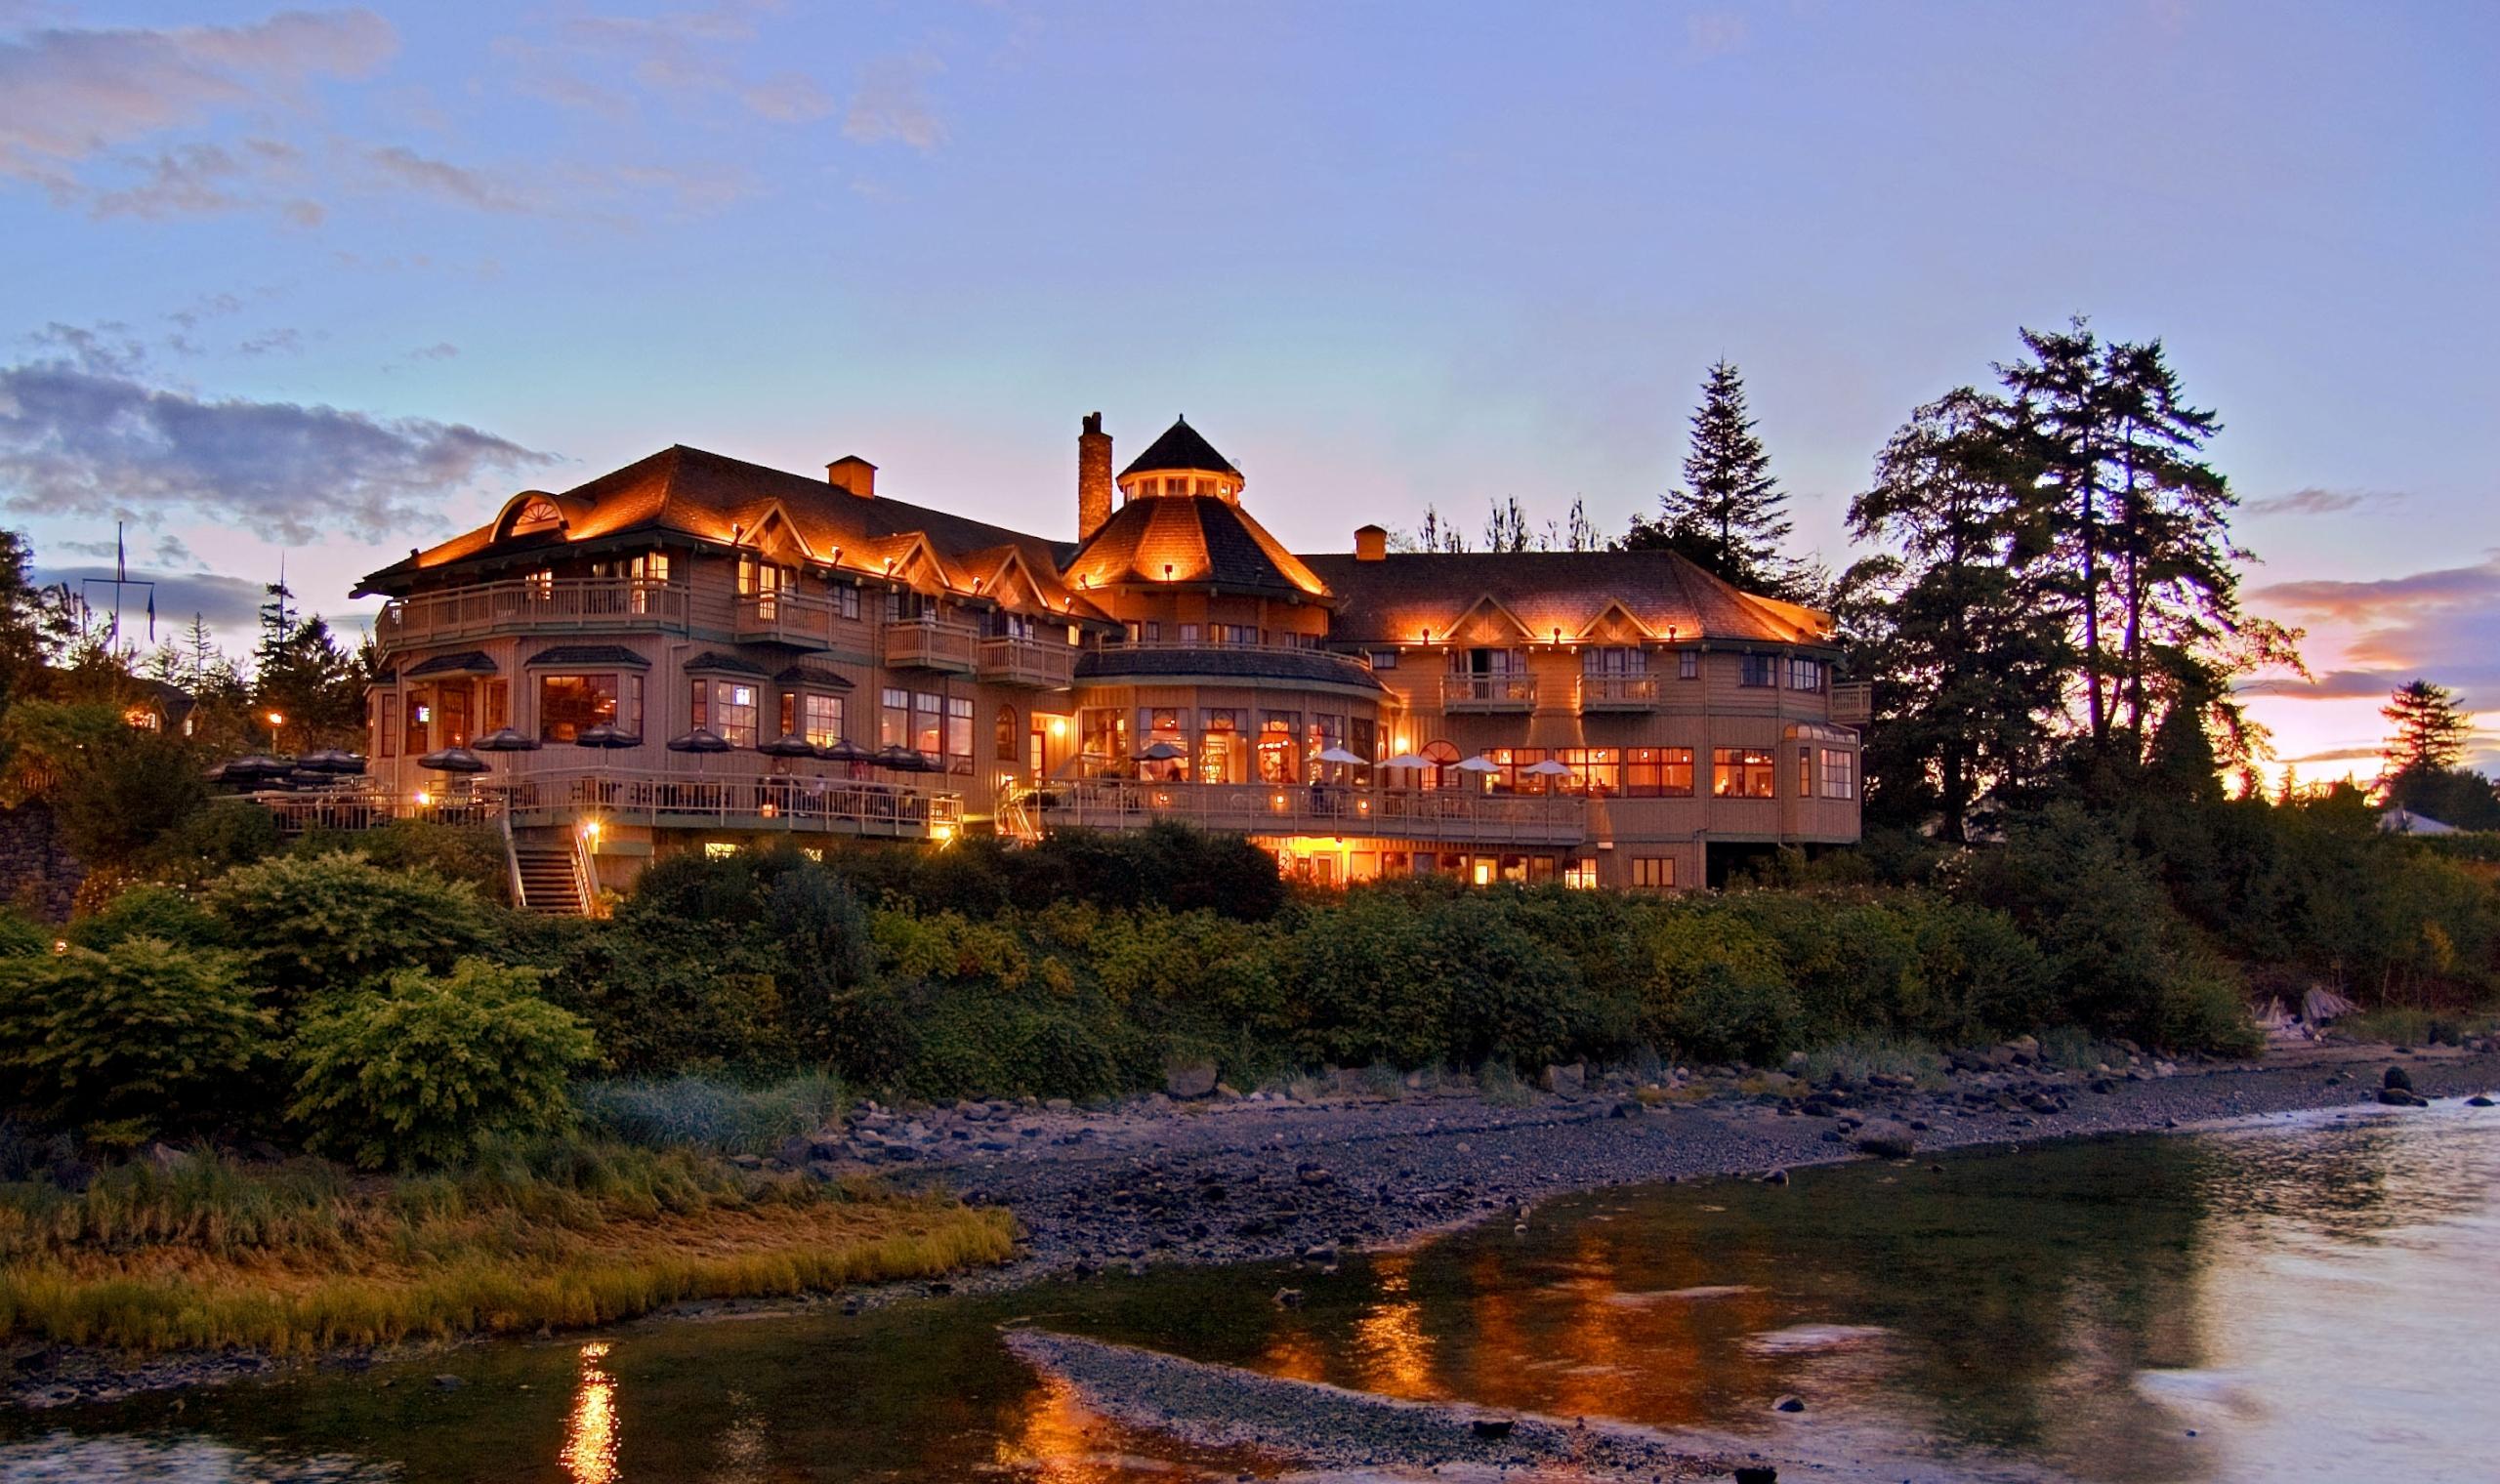 Painter's Lodge - Canada | Canadian Affair